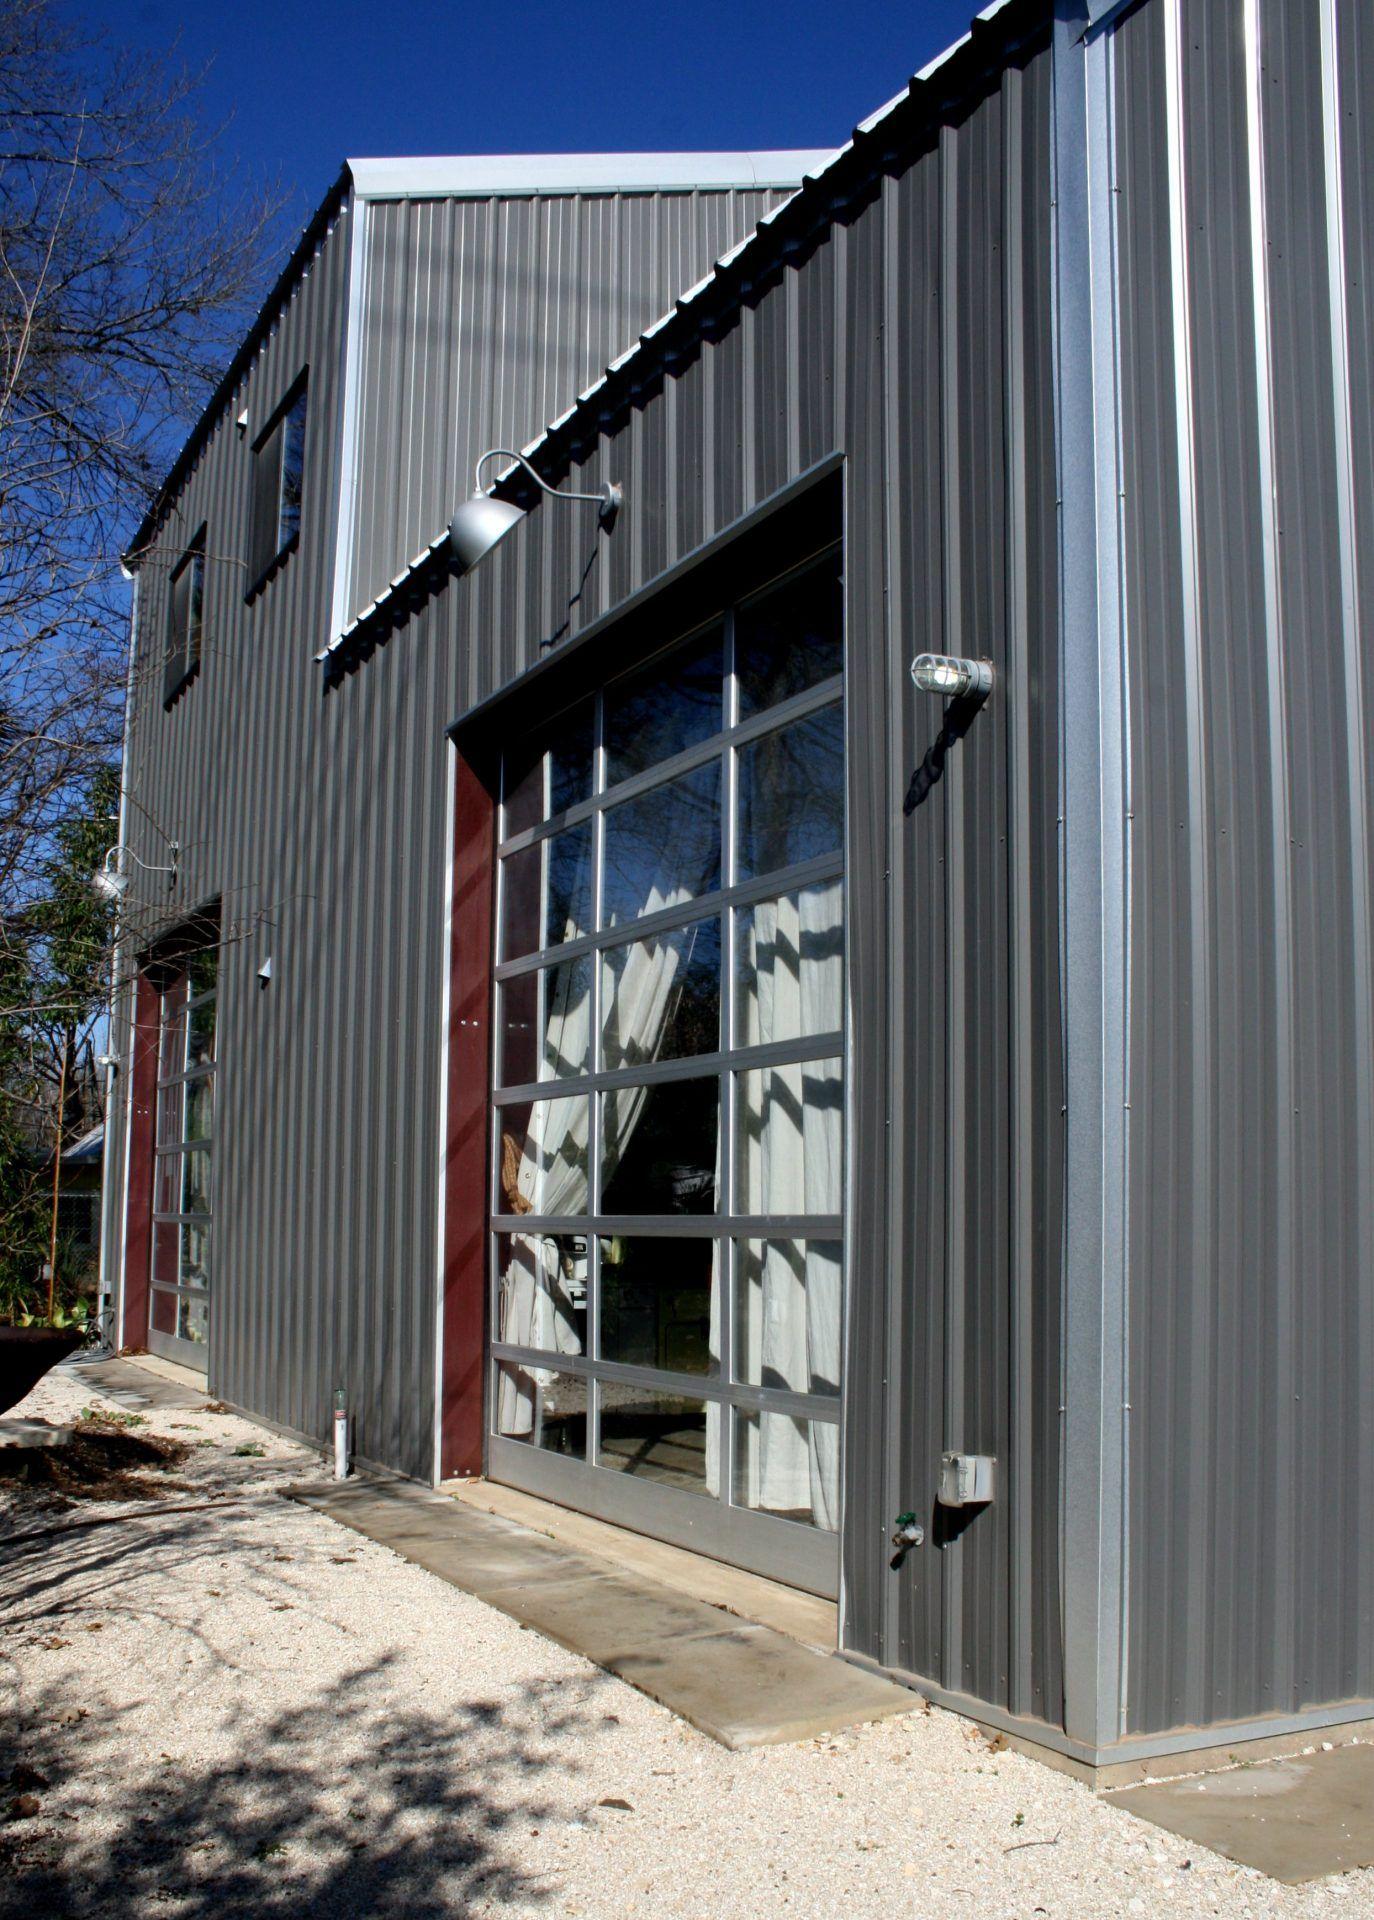 40 barndominium floor plans for your dreams home pinterest